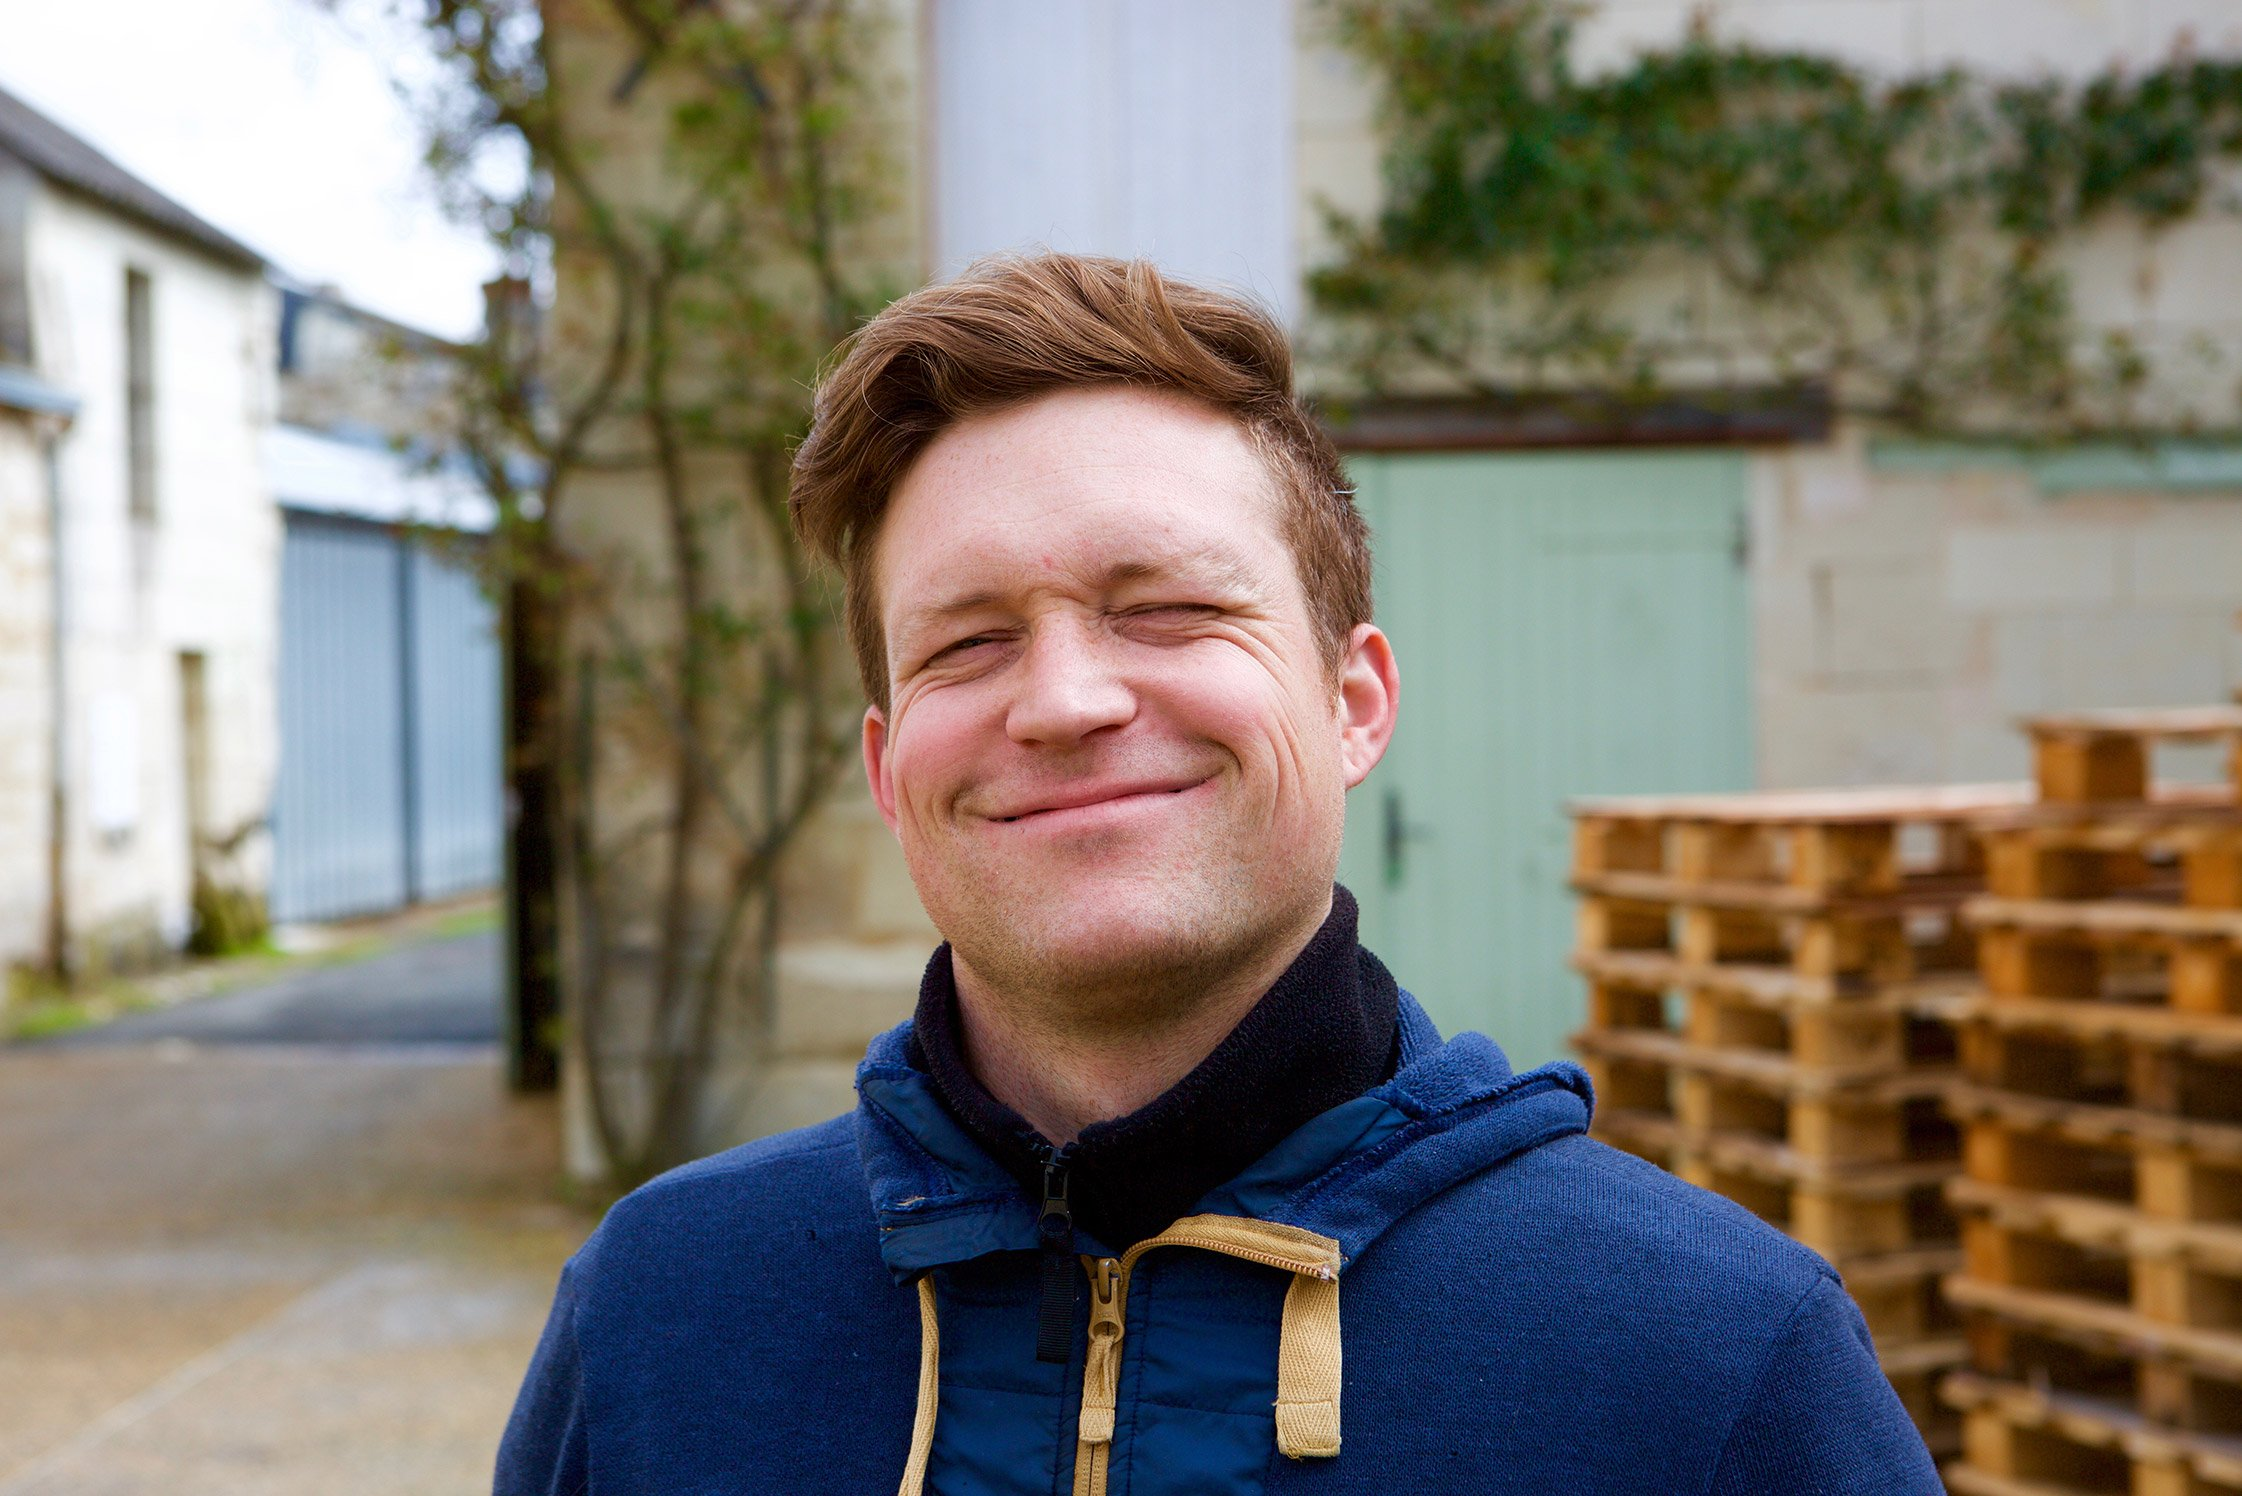 Brendan Stater-West at Romain Guiberteau's winery